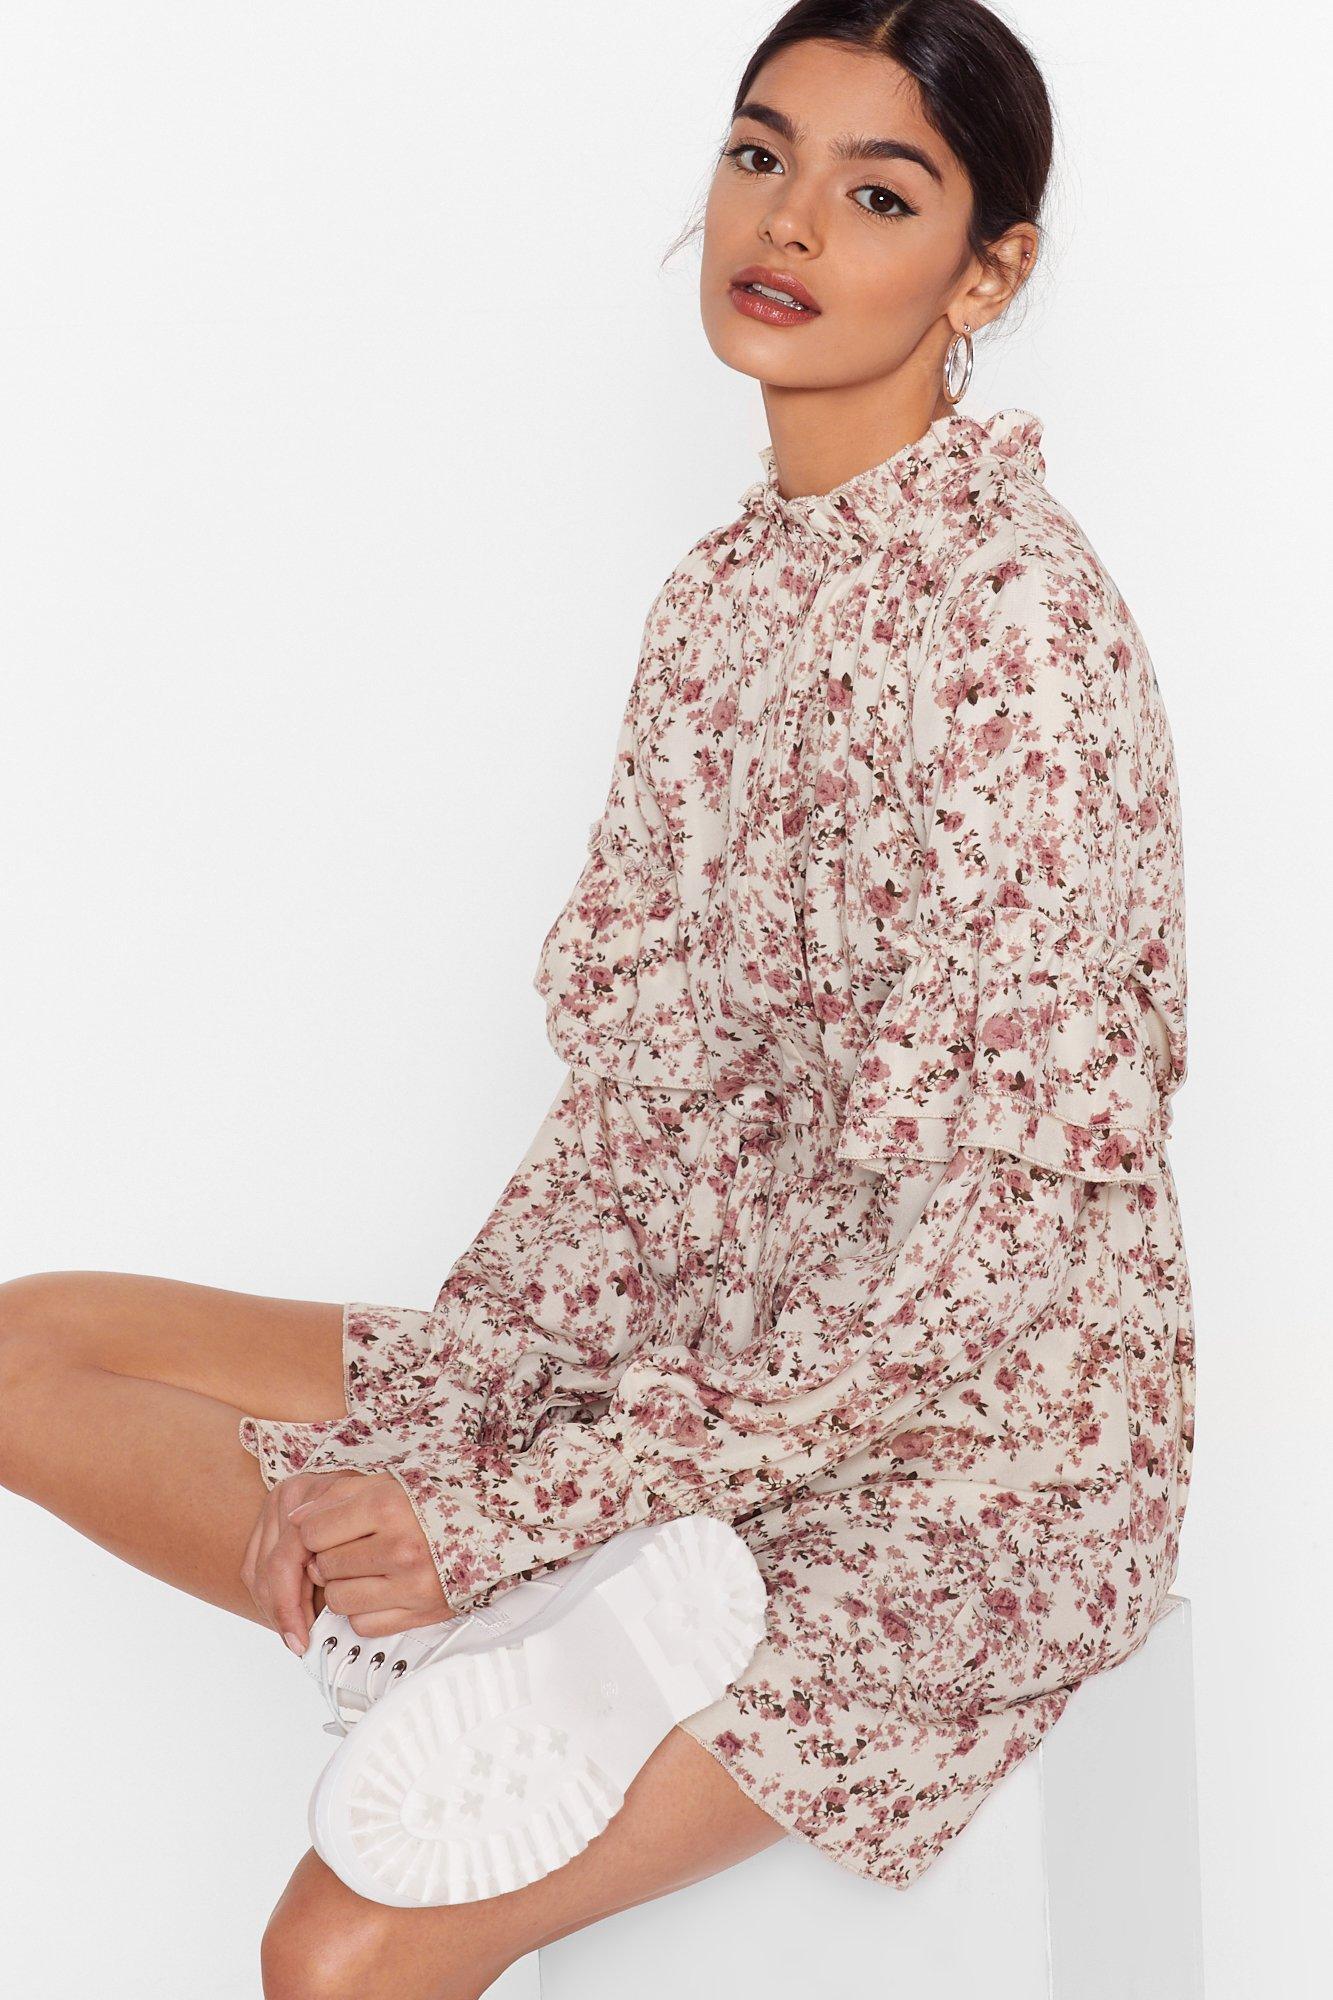 Image of Plant Stop Me Now Floral Mini Dress